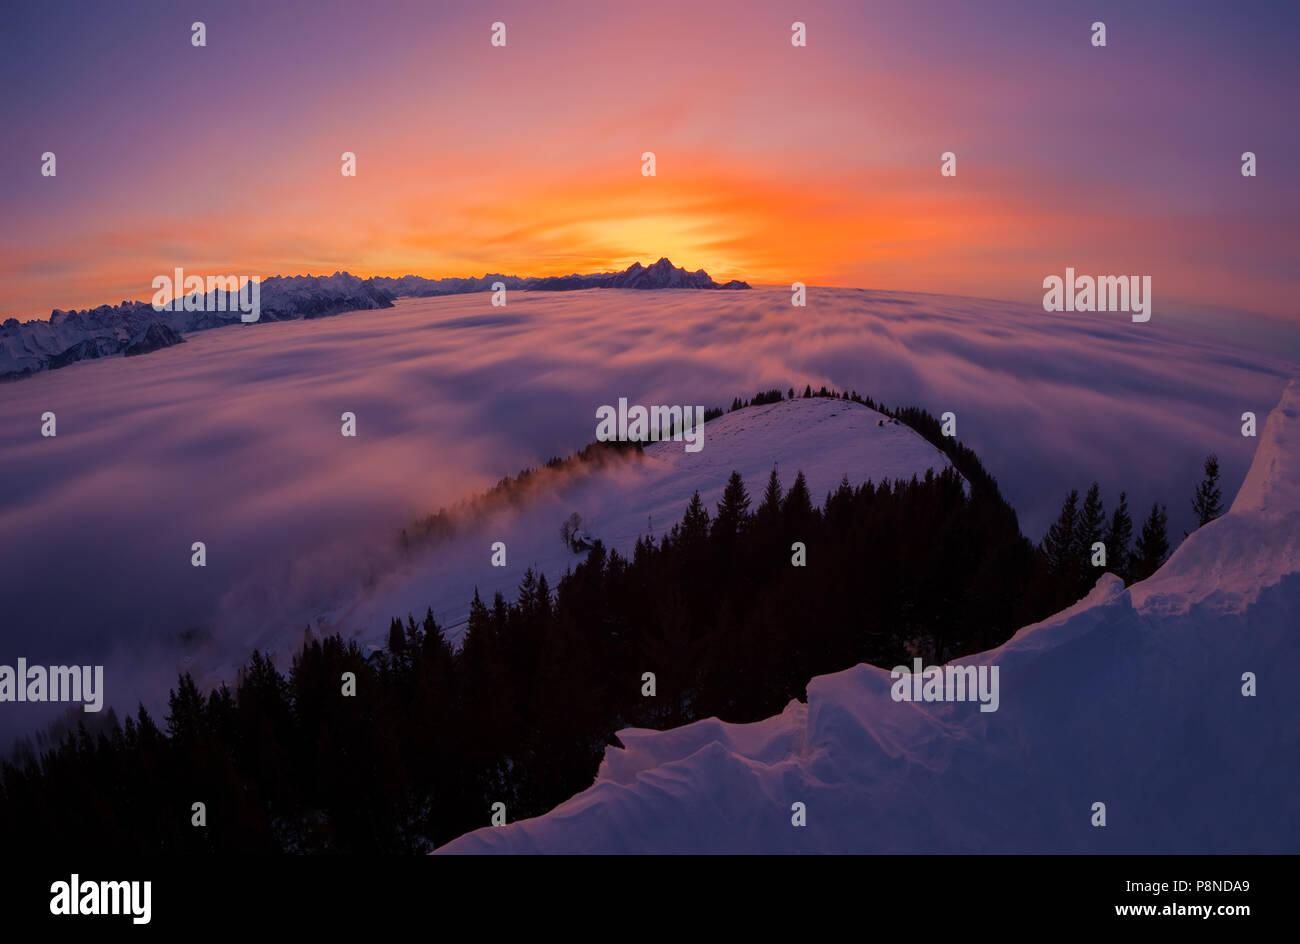 sunset-over-clouds-P8NDA9.jpg